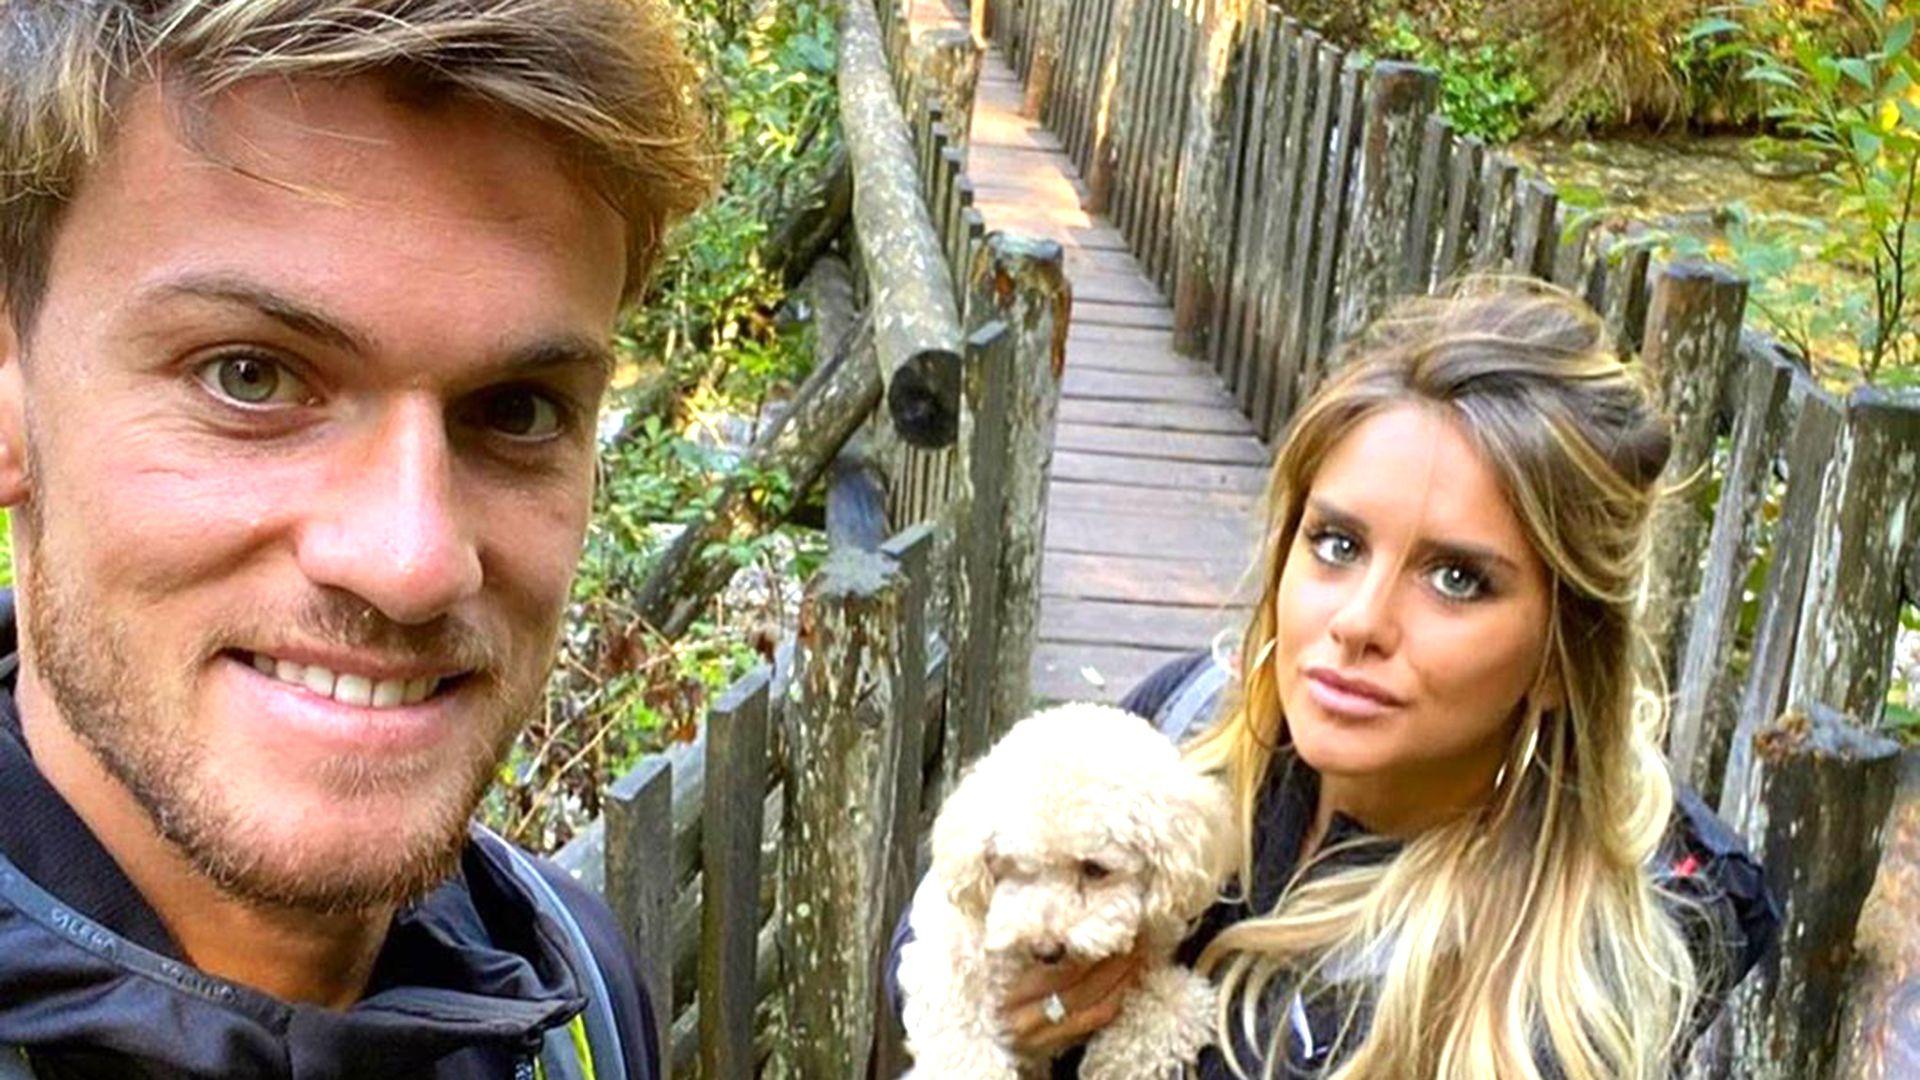 Daniele Rugani y su pareja dieron positivo de coronavirus (@michelapersico)